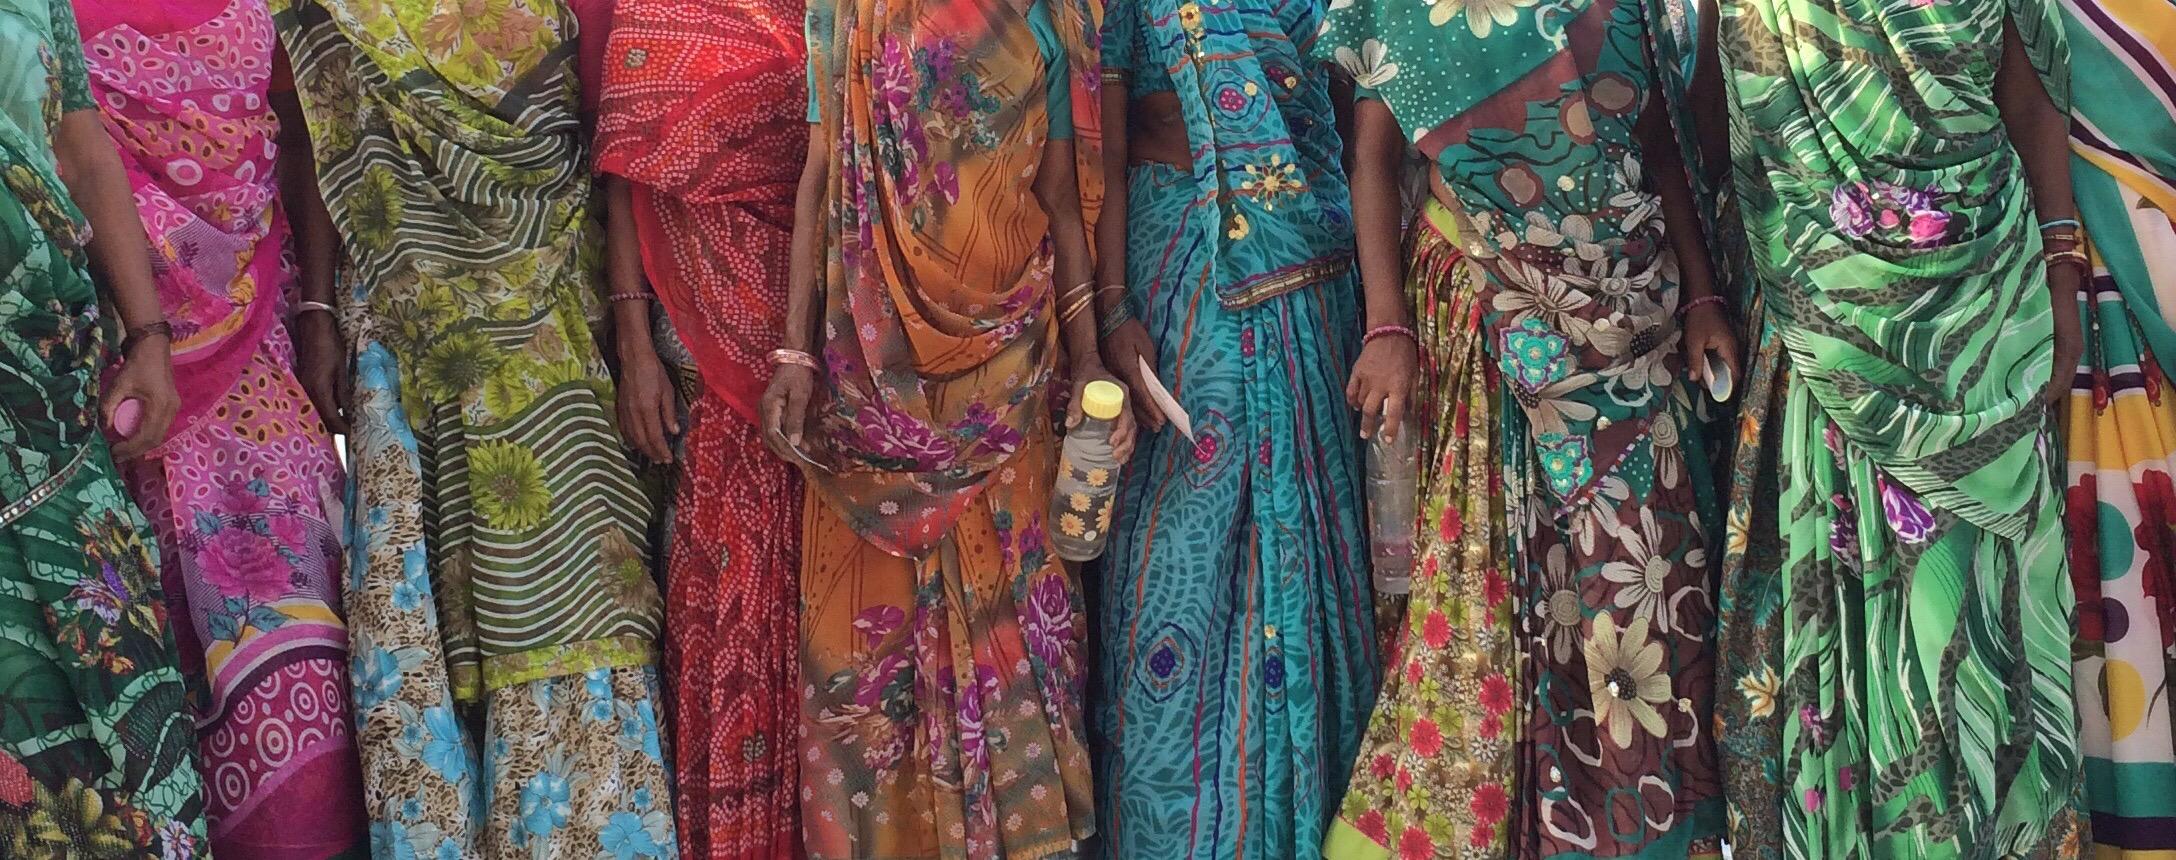 Copy of Many Saris